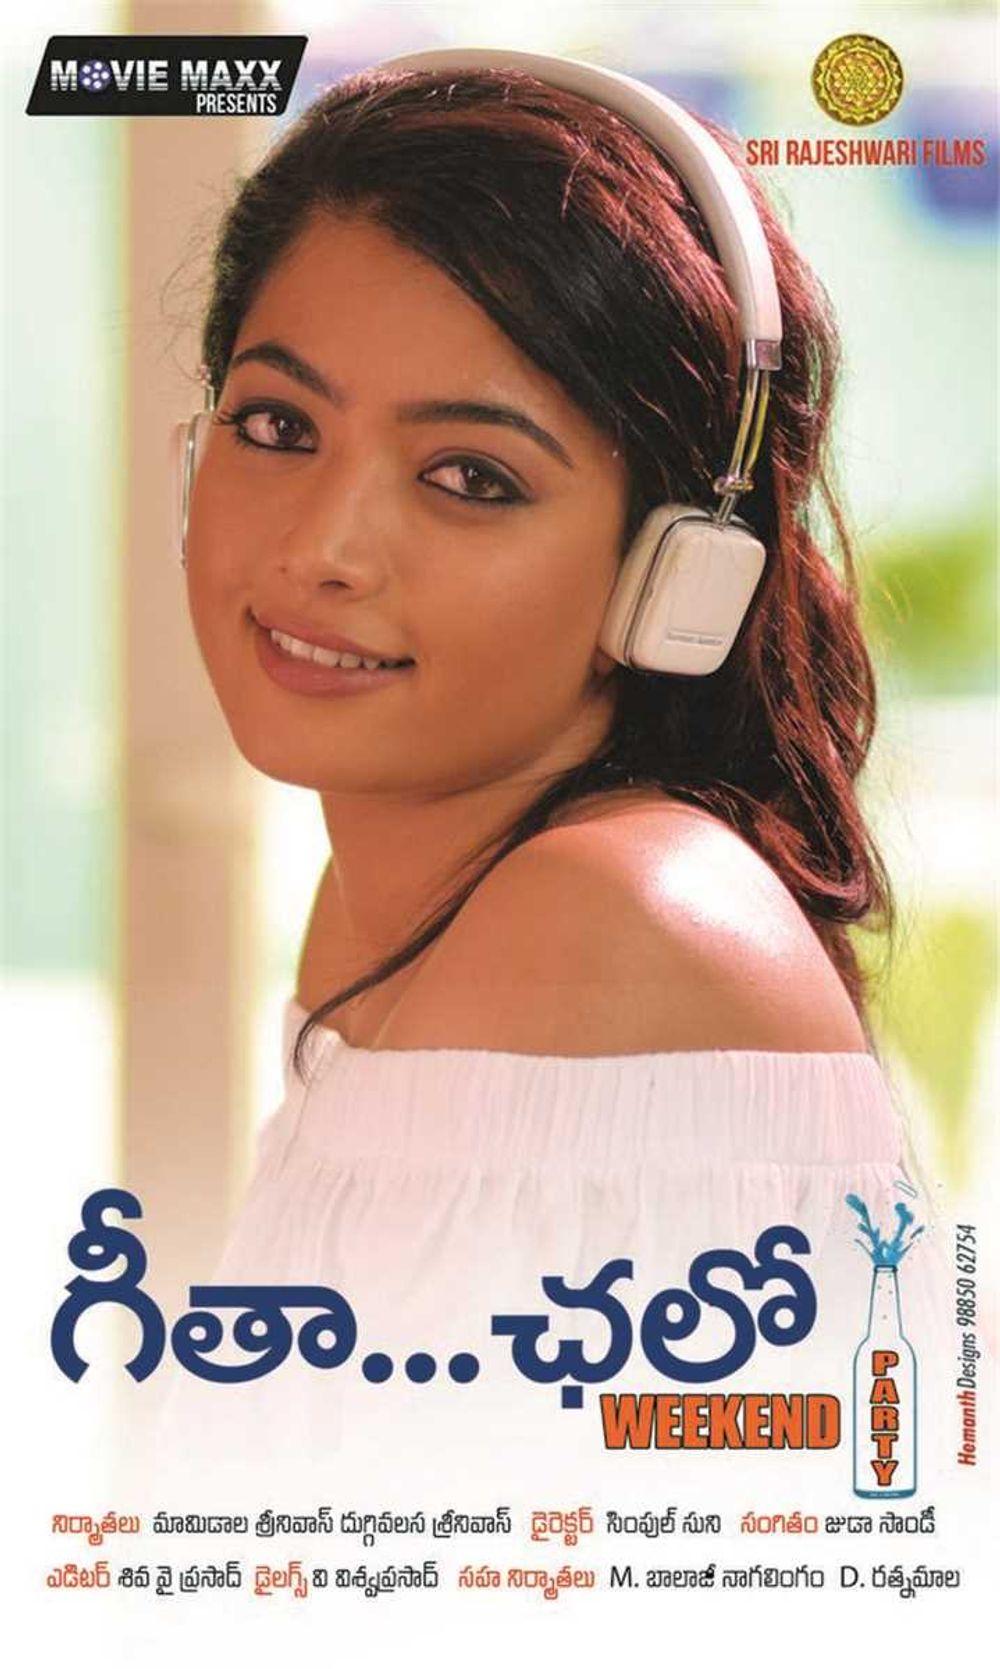 3-Geetha Chalo